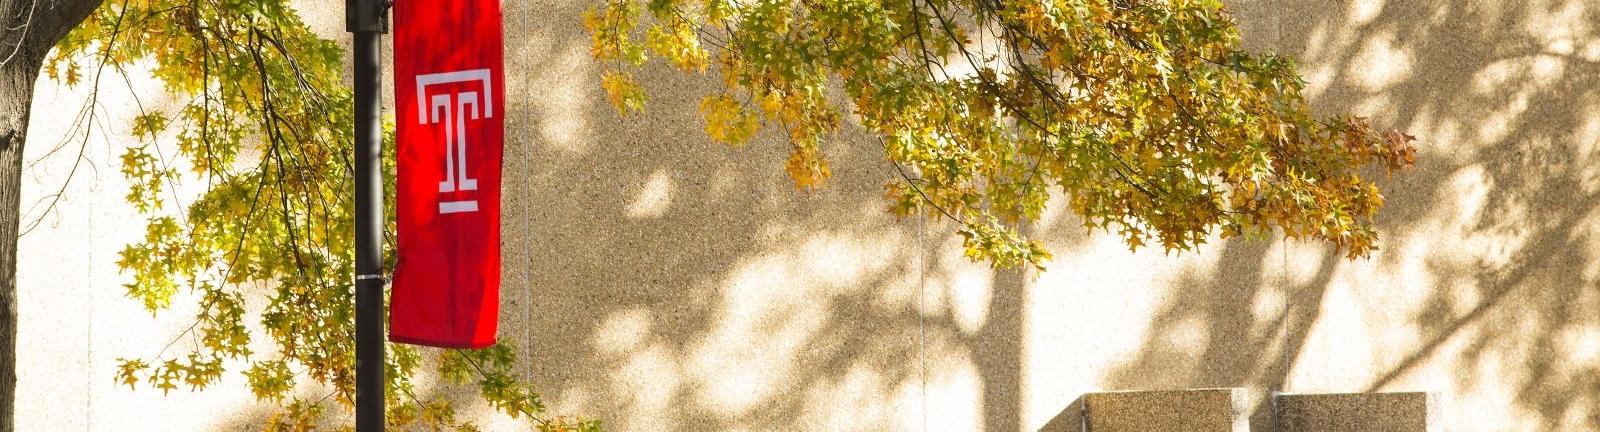 Autumn tree shadow on sunny wall